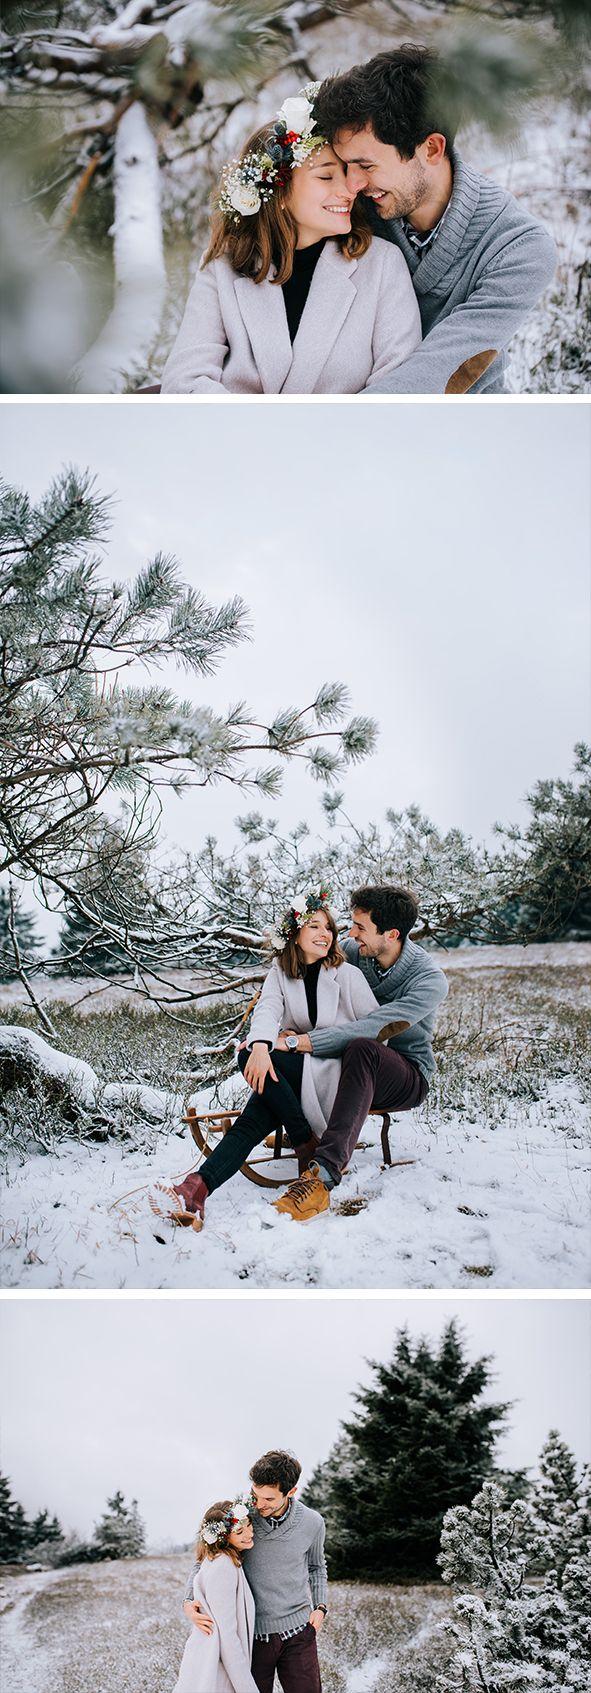 Photo of PÄRCHEN // SAUERLAND // Engagement shoot in the Sauerland Forest #wedding #engag …